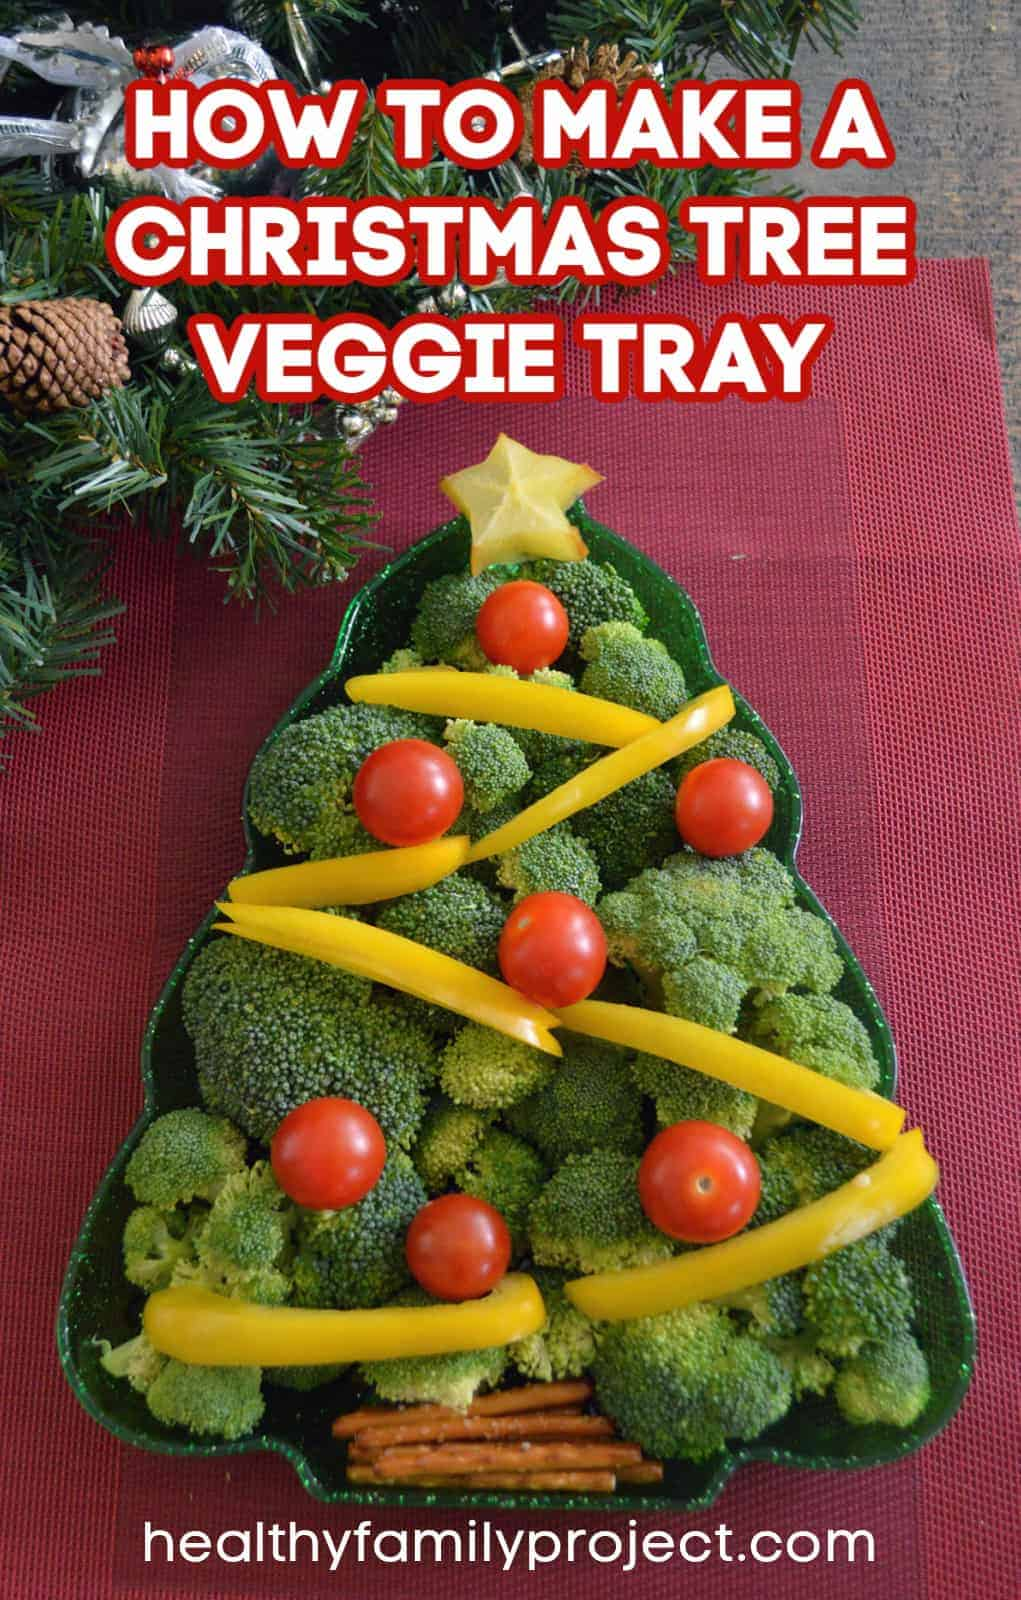 How To Make A Christmas Tree Veggie Tray